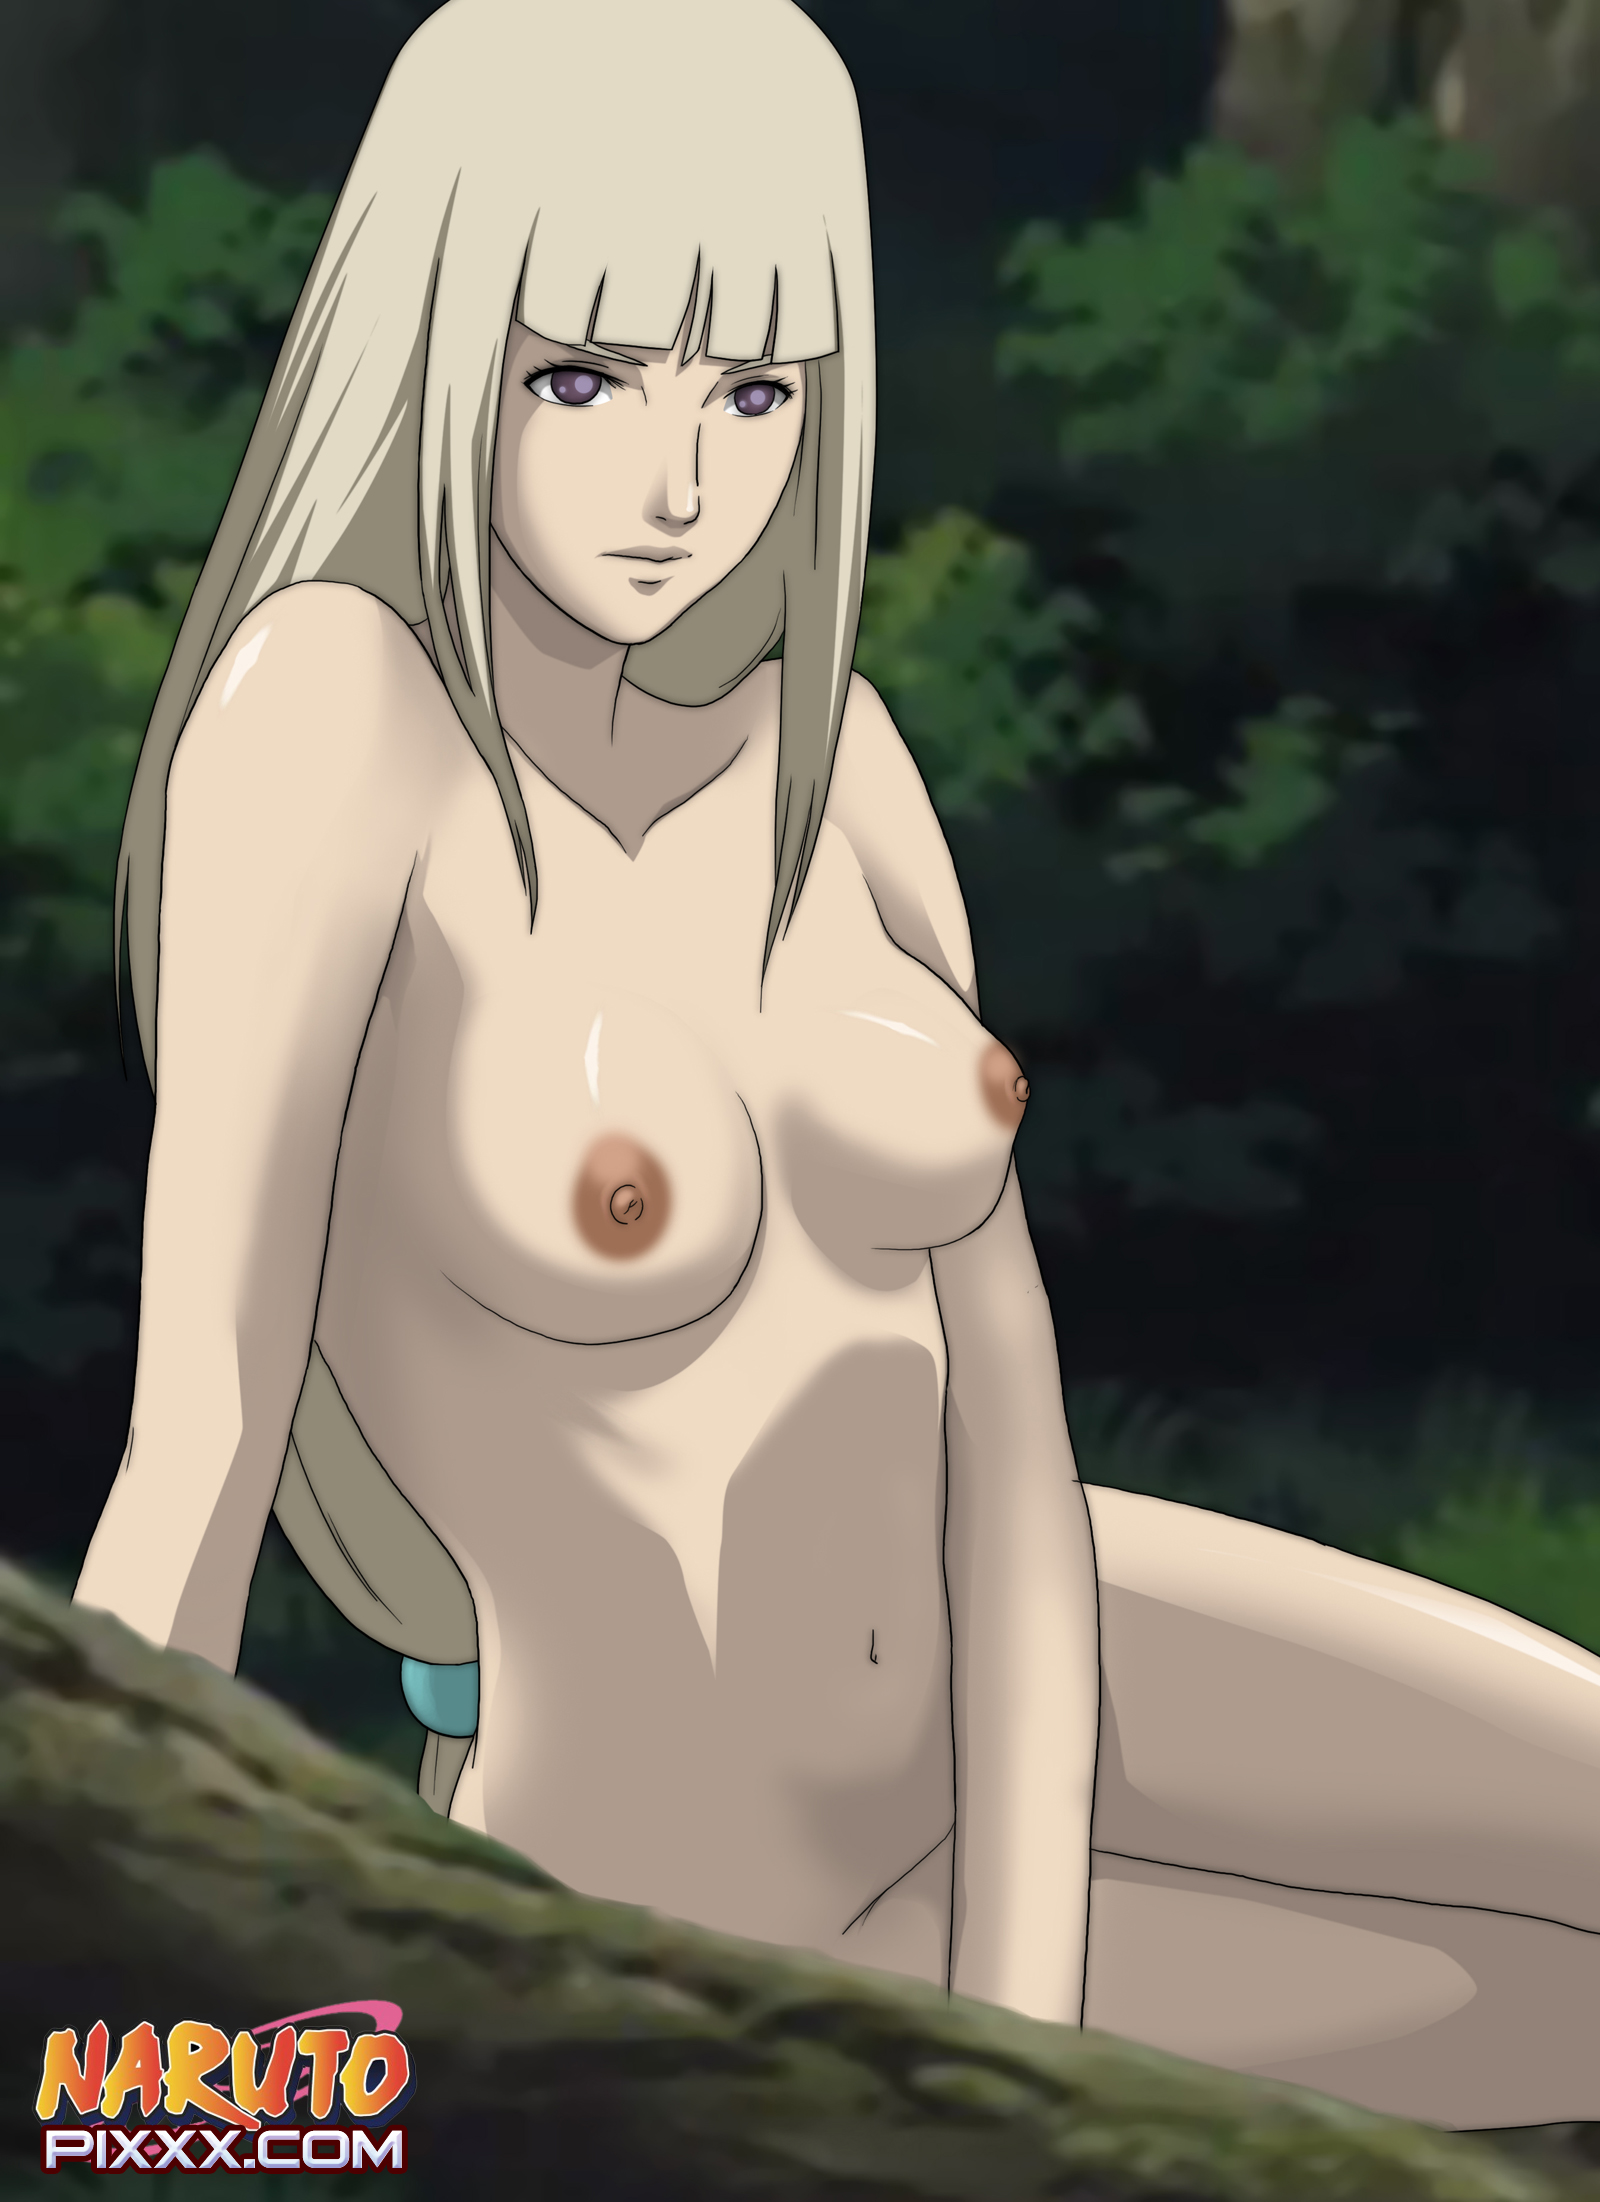 naruto-golie-telki